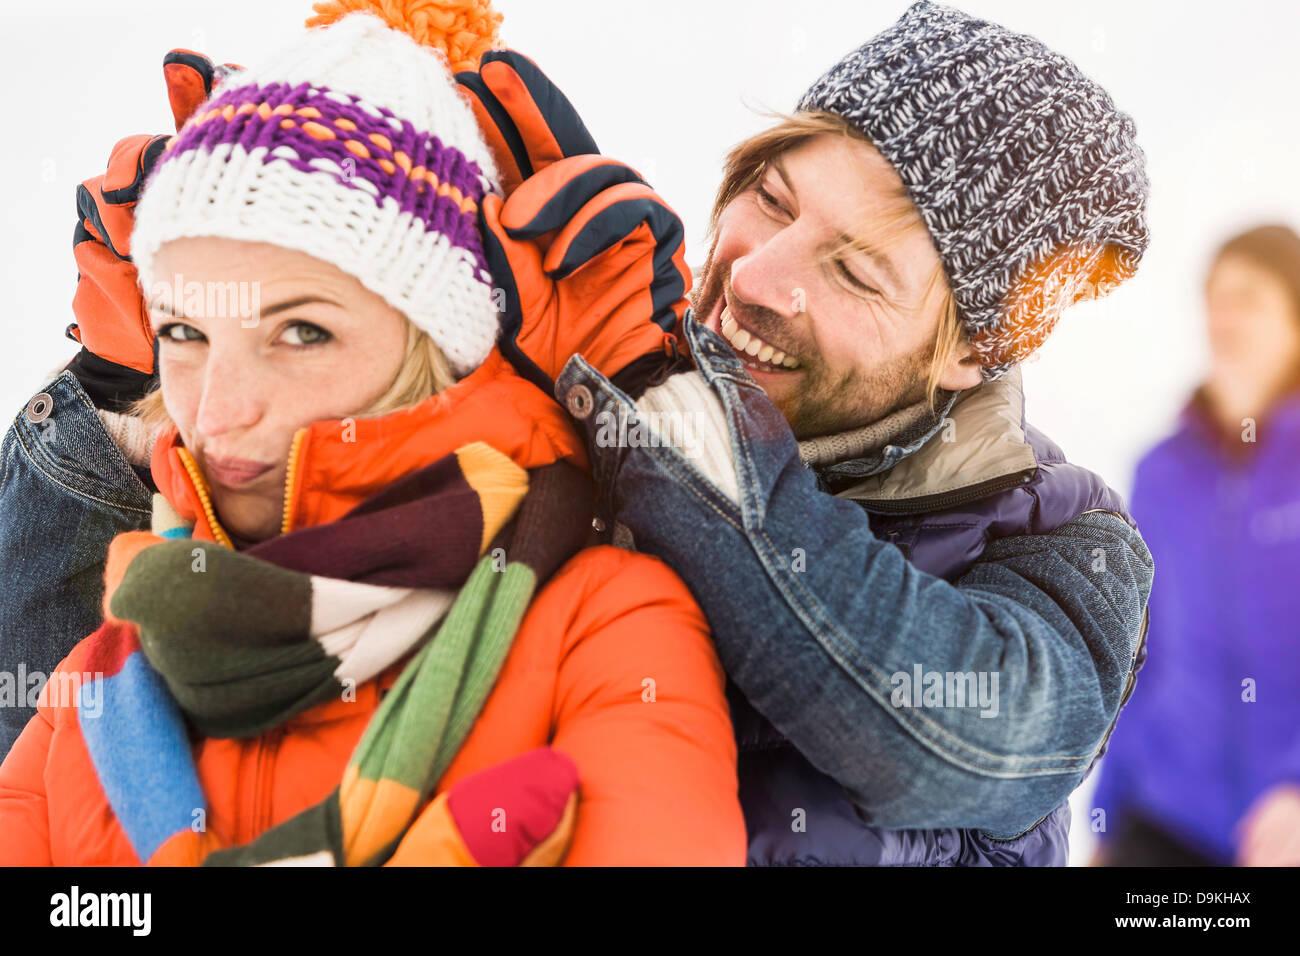 Man making bunny ears behind woman wearing knit hat - Stock Image